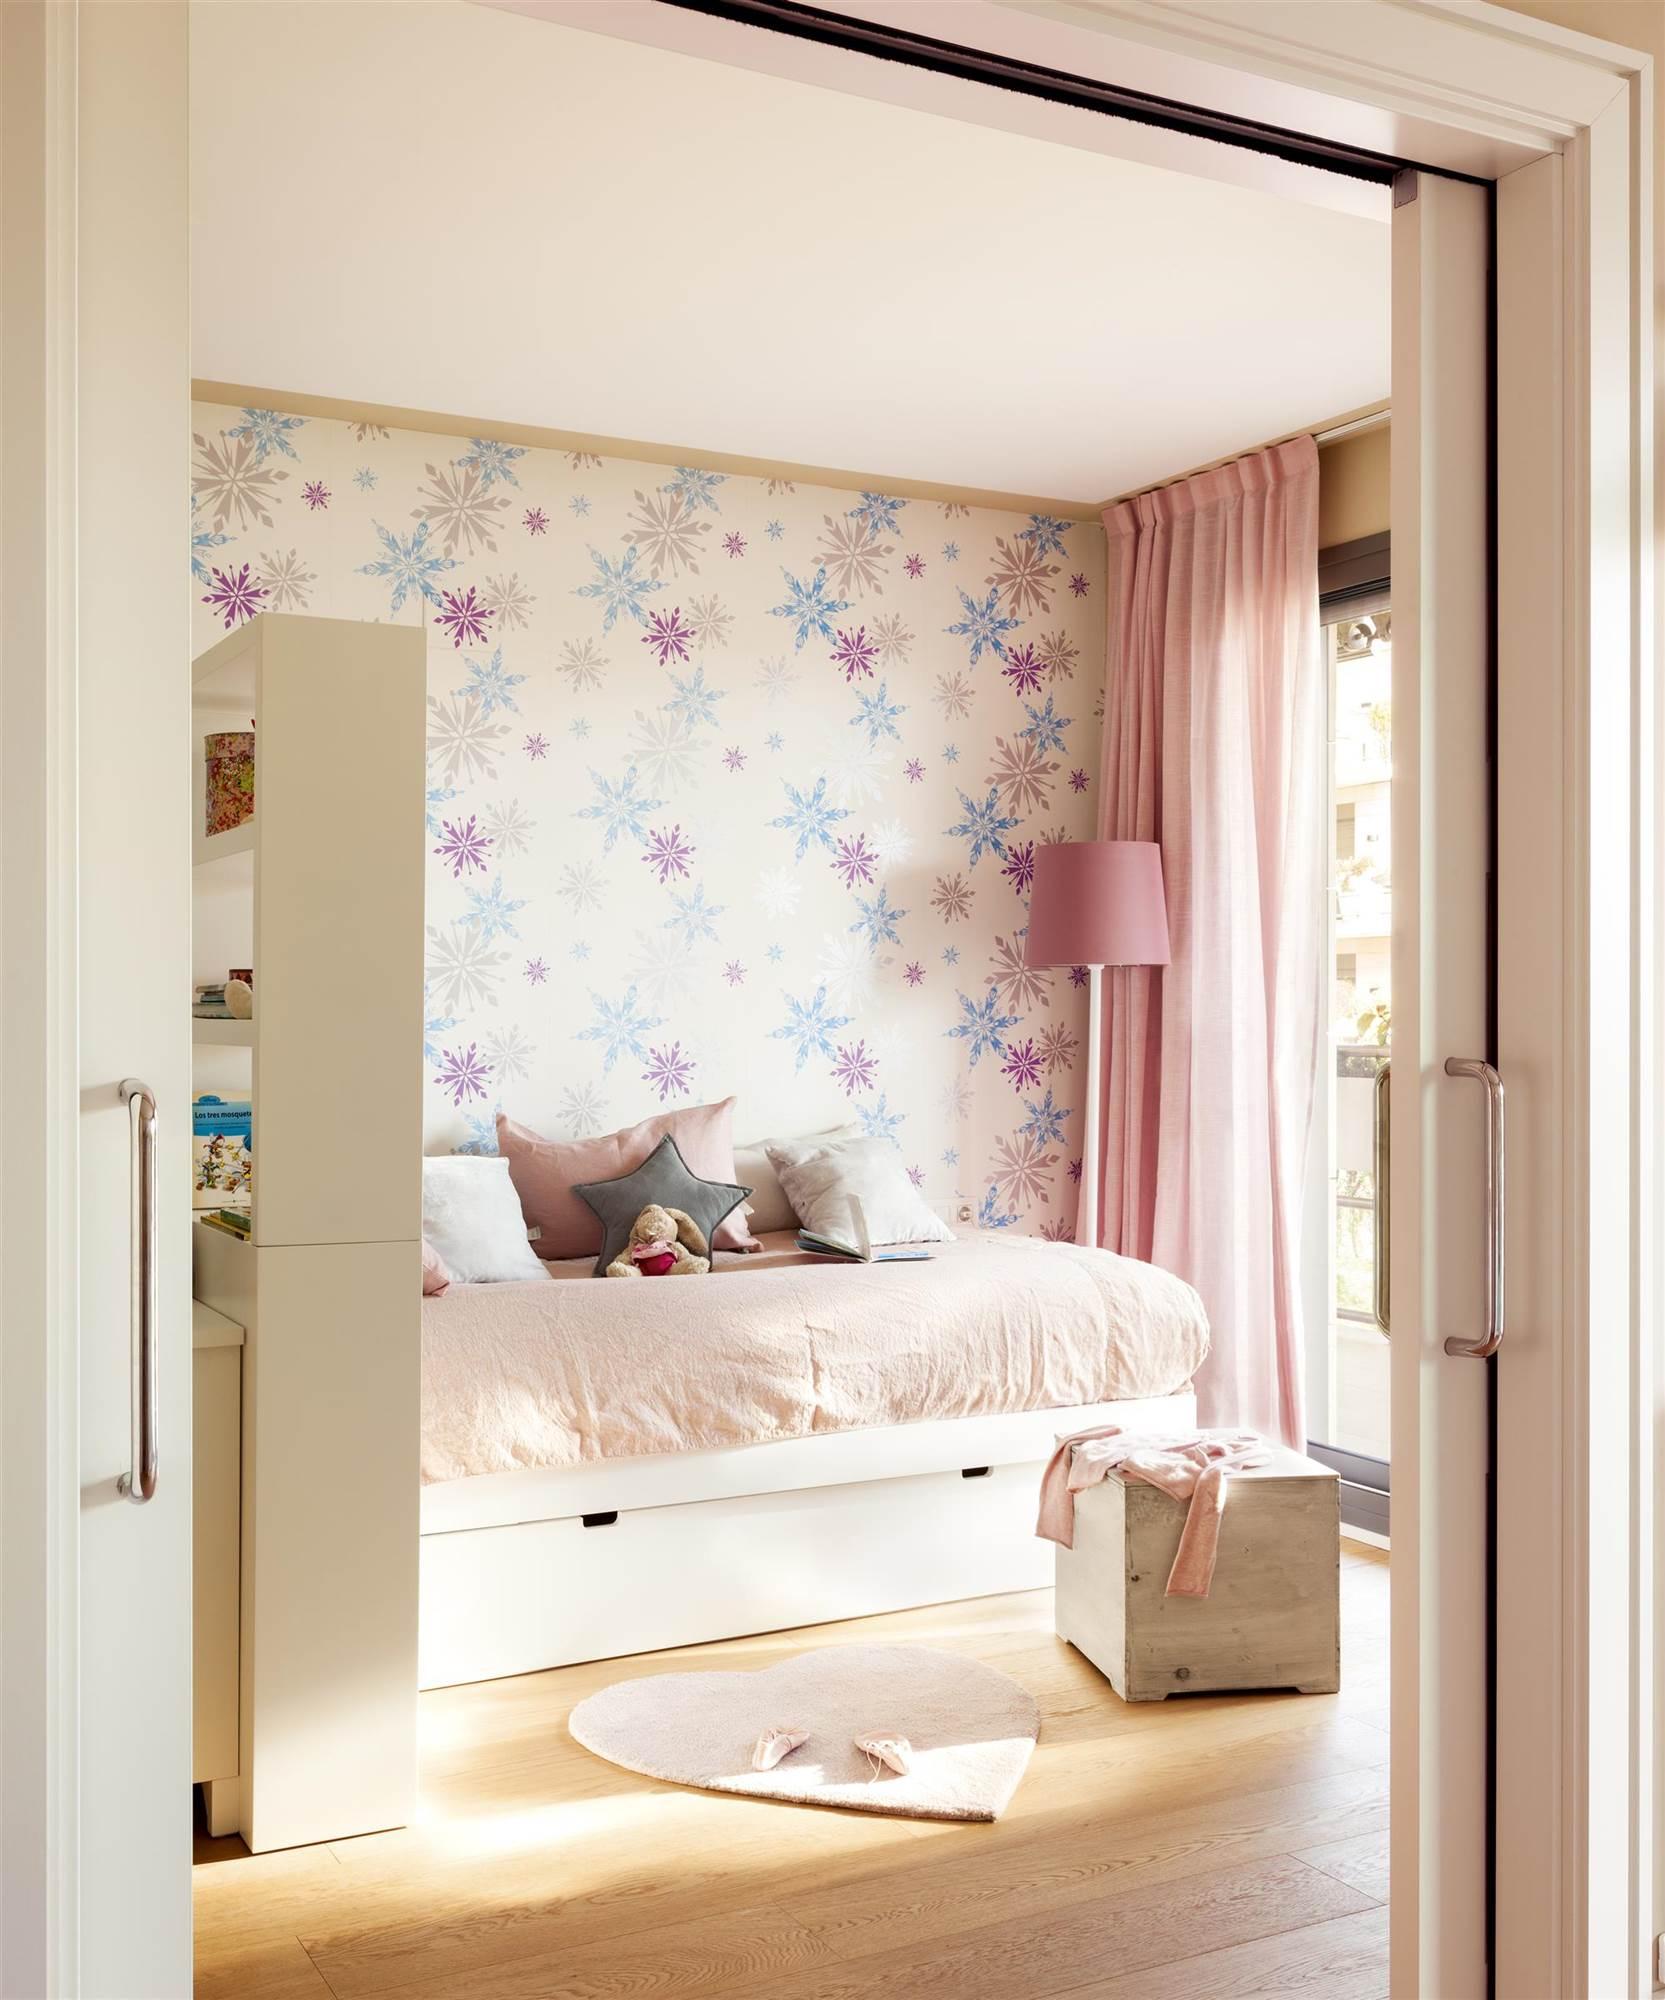 834 fotos de ni os - Papel pintado dormitorio principal ...